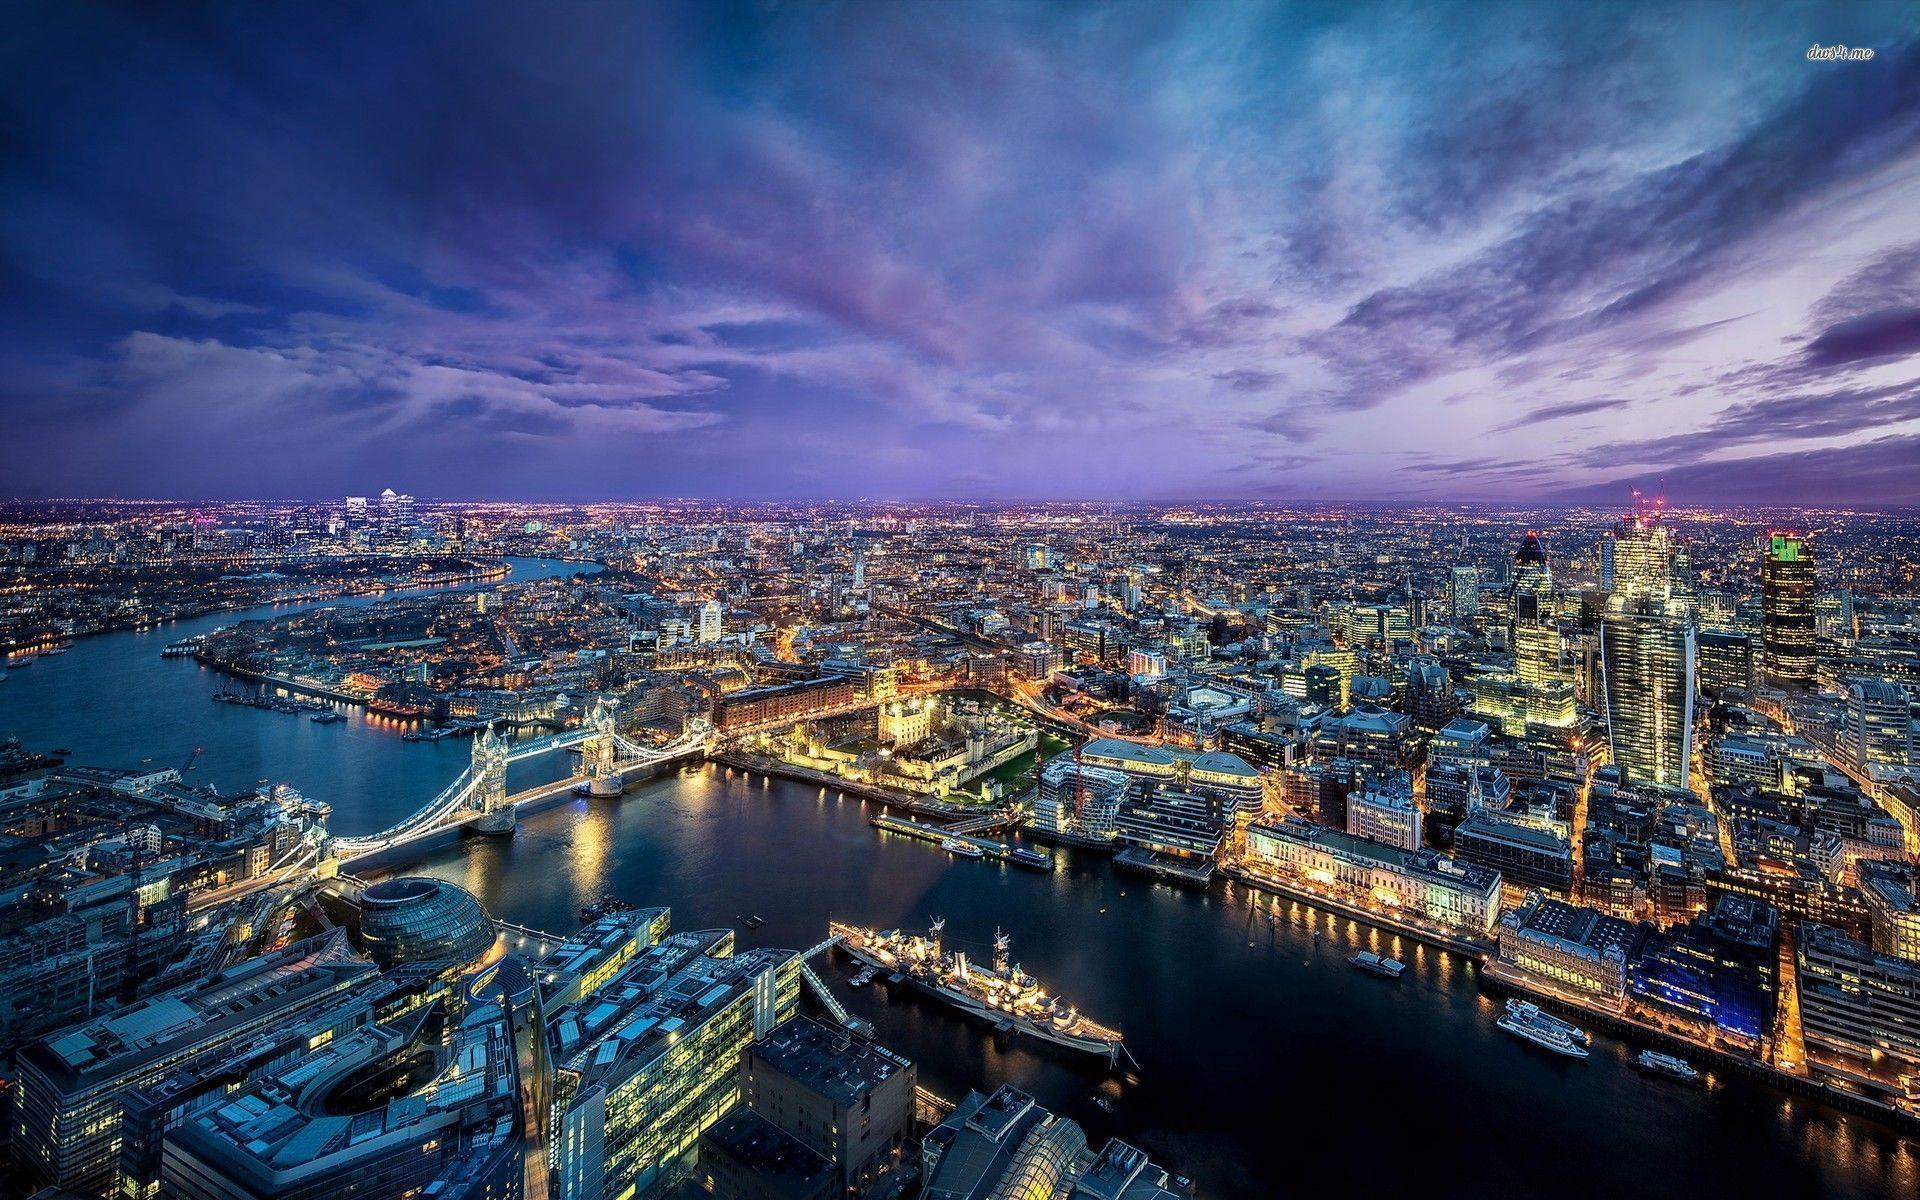 london wallpaper wallpaperwallpapersfree - photo #29